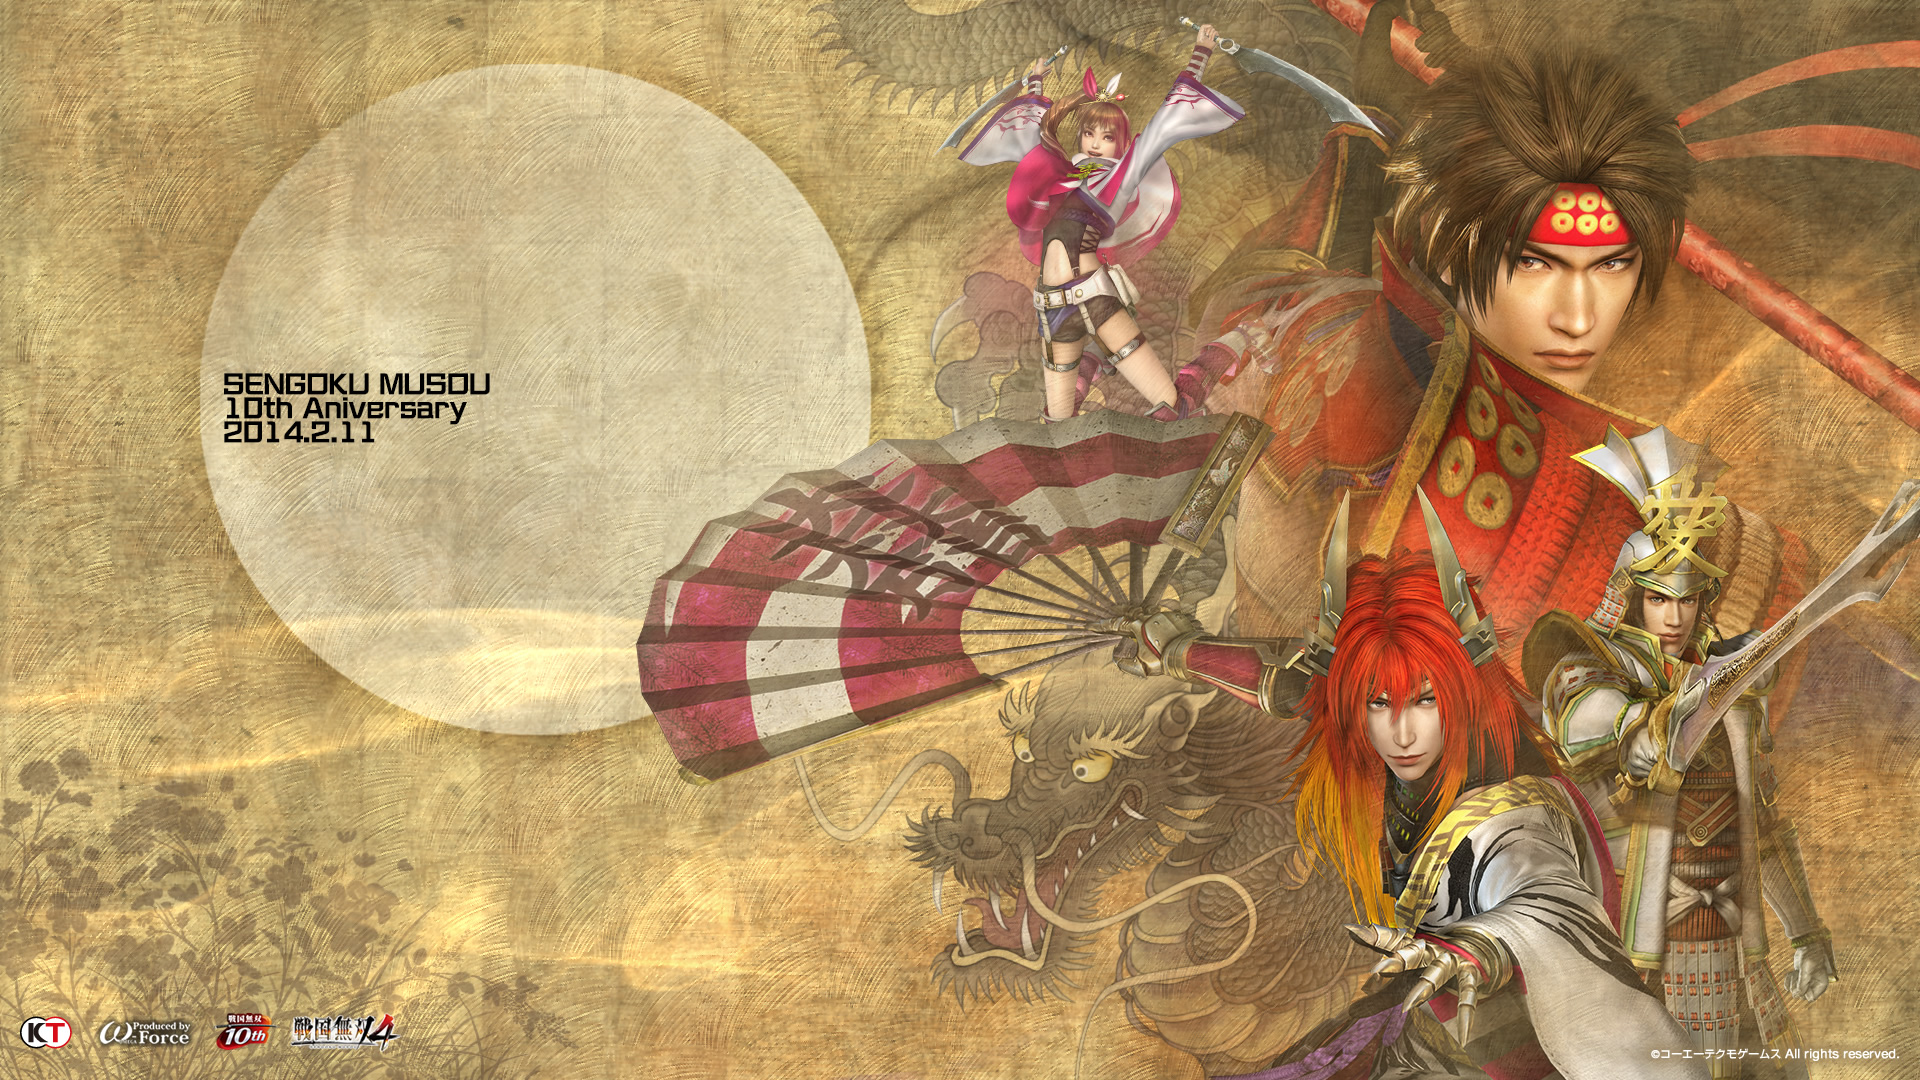 Samurai Warriors (series) | Koei Wiki | FANDOM powered by Wikia